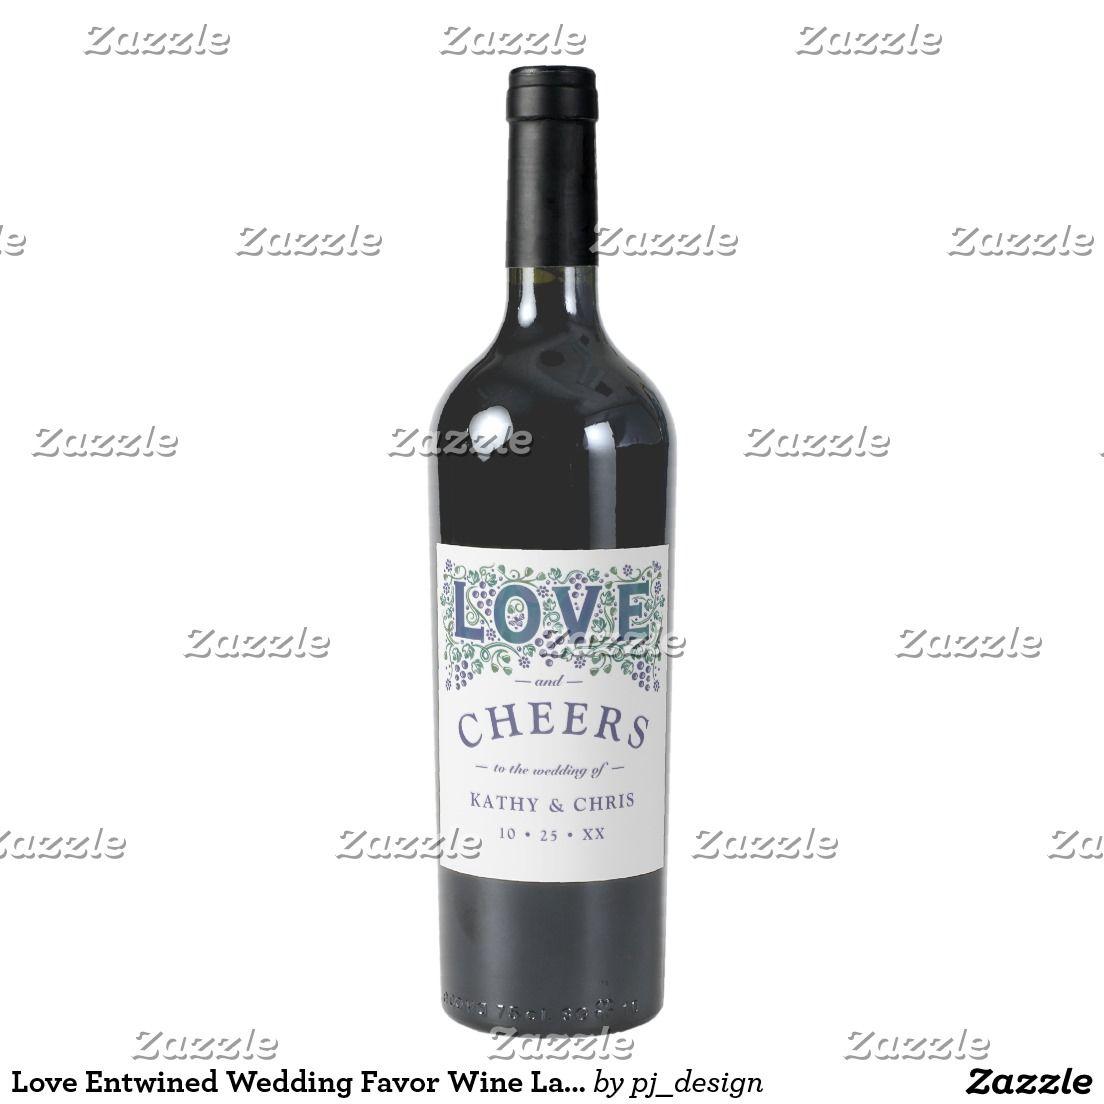 Love Entwined Wedding Favor Wine Label | Weddings & More | Pinterest ...